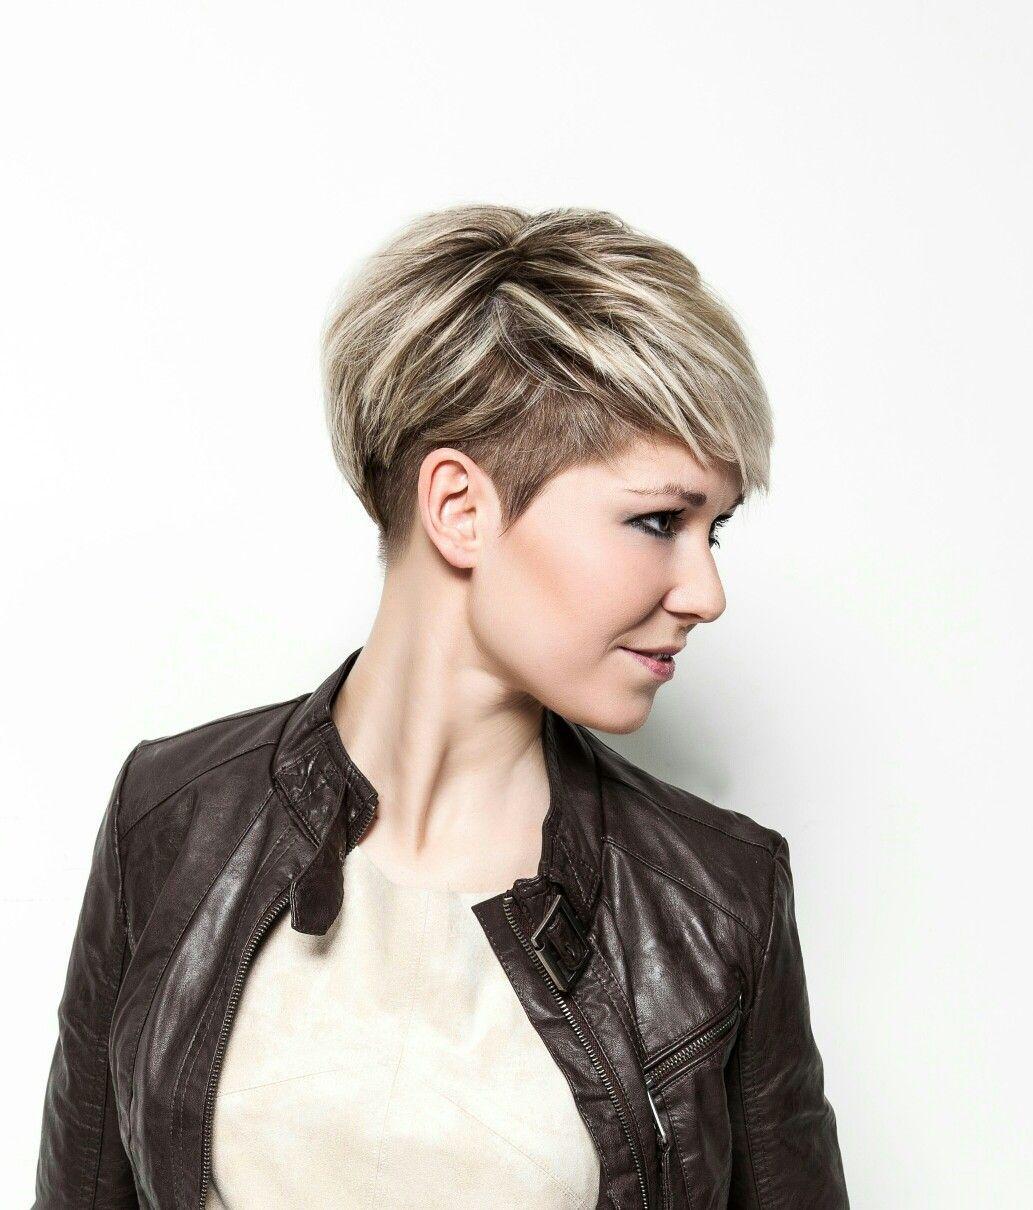 Pin by izabela wałęsa on wawa in pinterest hair short hair